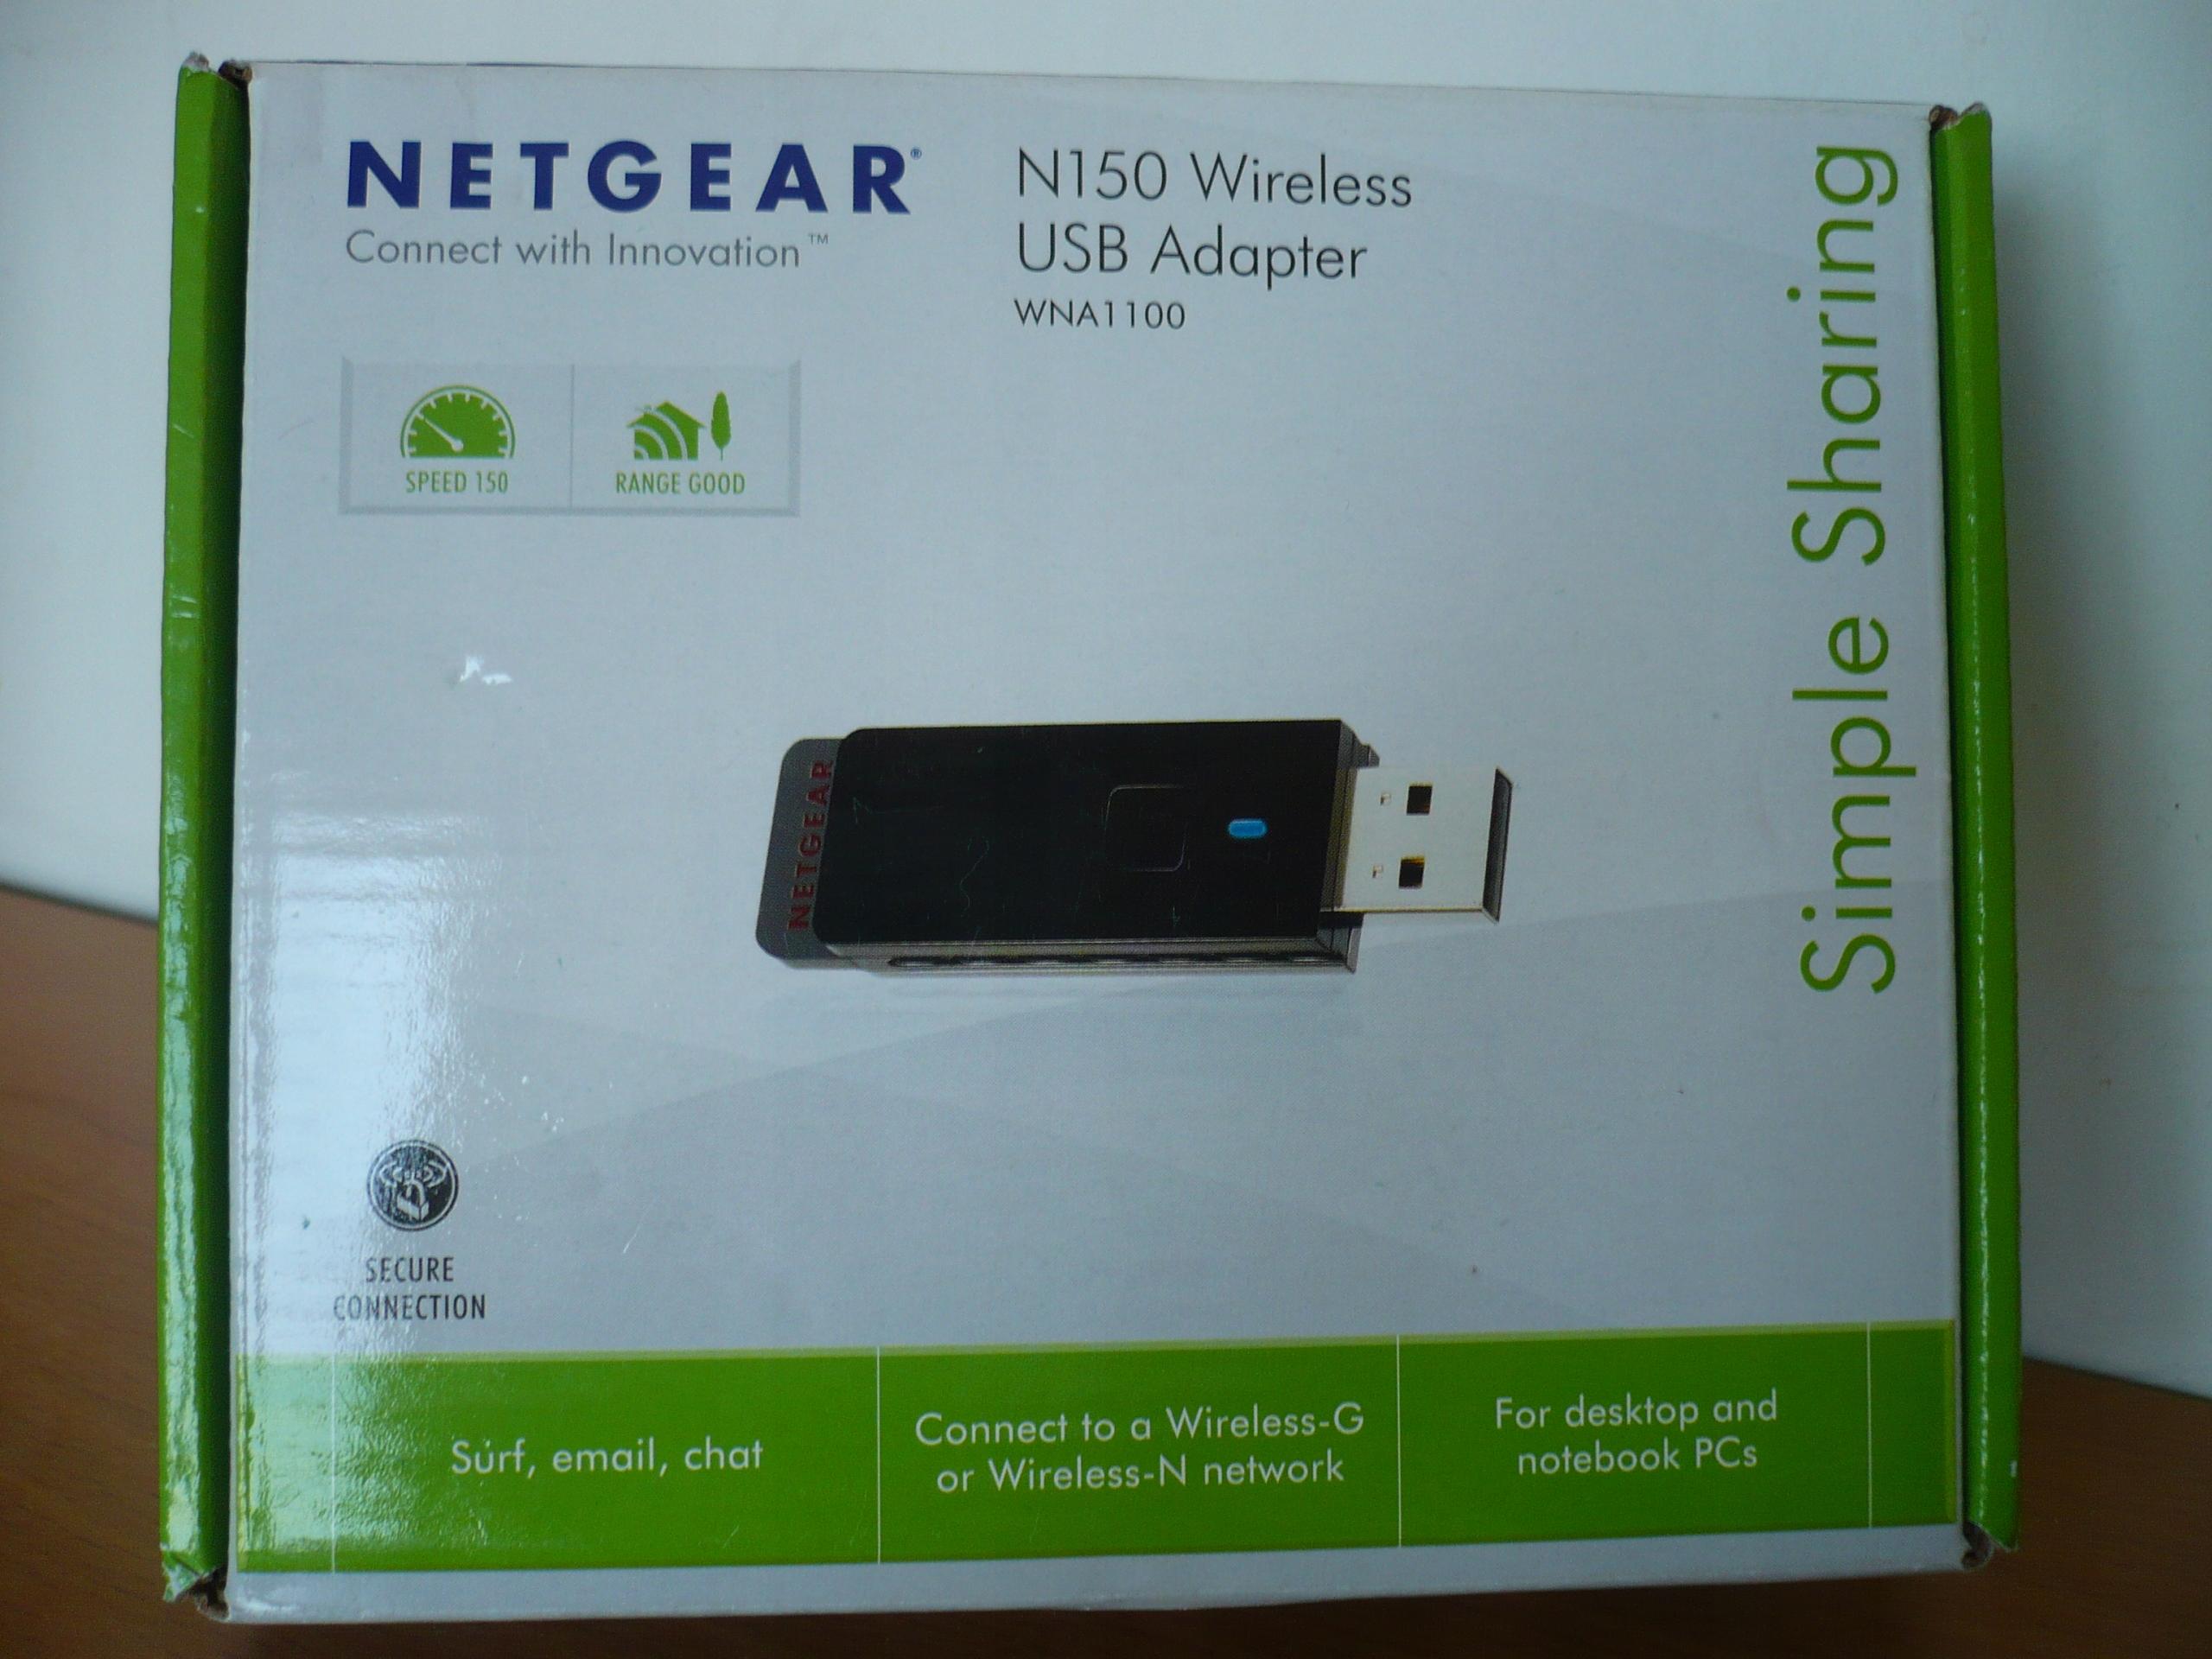 NETGEAR N150 WIRELESS MICRO USB ADAPTER DRIVERS FOR MAC DOWNLOAD